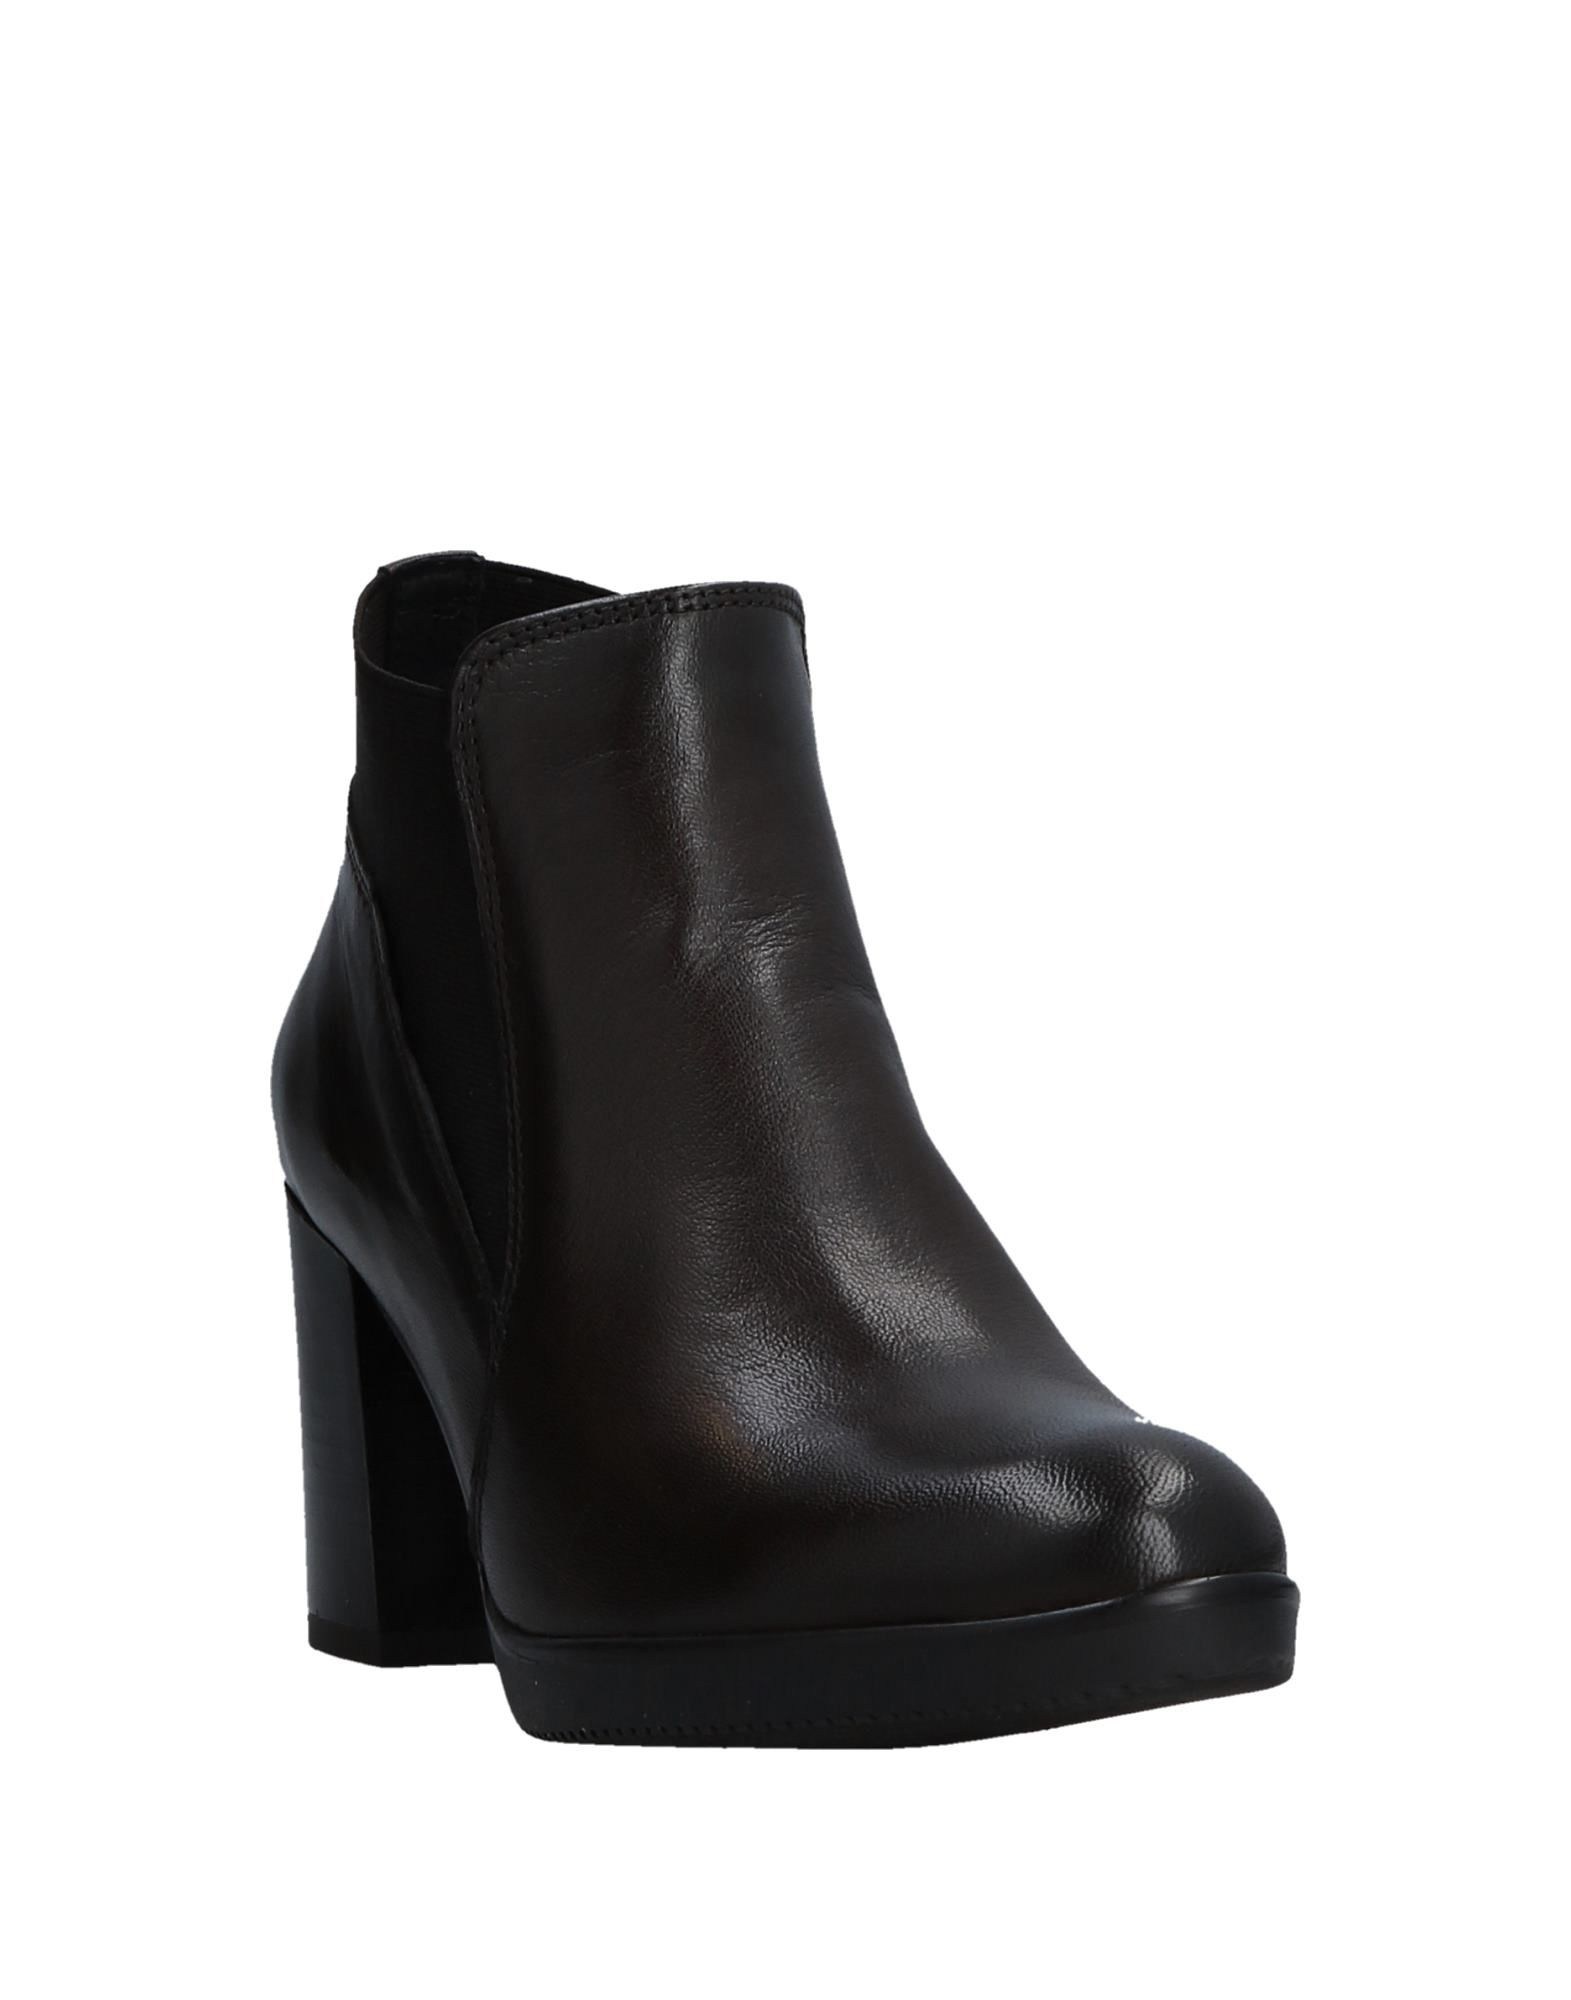 Cafènoir Stiefelette Gute Damen  11515128WX Gute Stiefelette Qualität beliebte Schuhe 9f2281